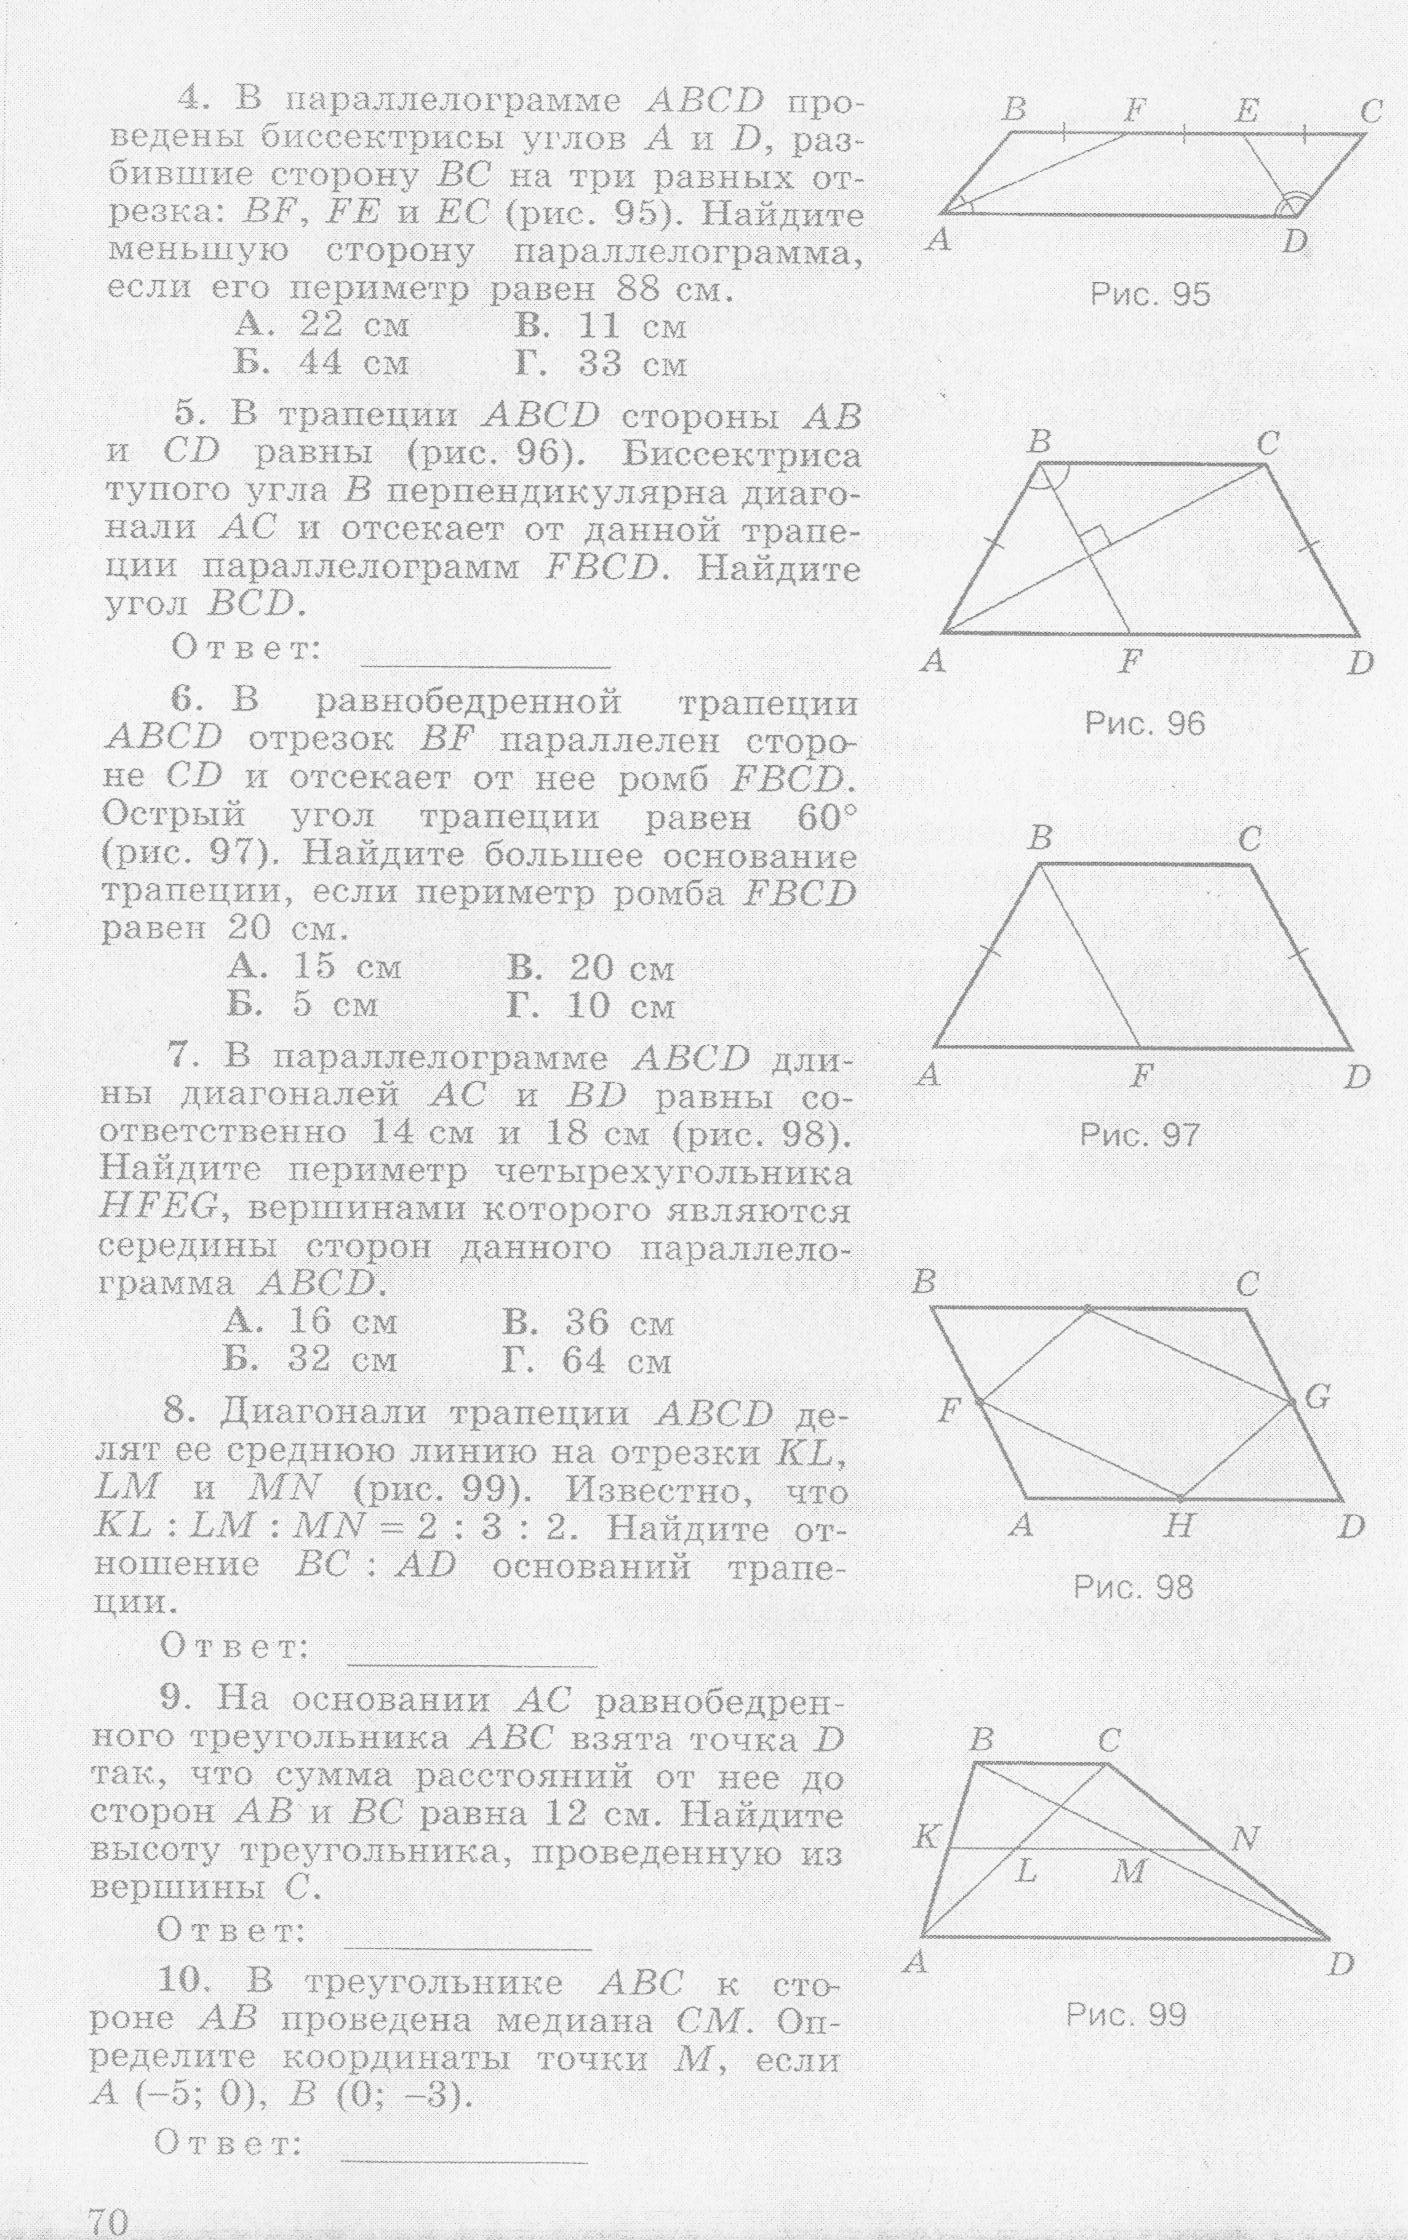 Перпендикулярный - perpendicular